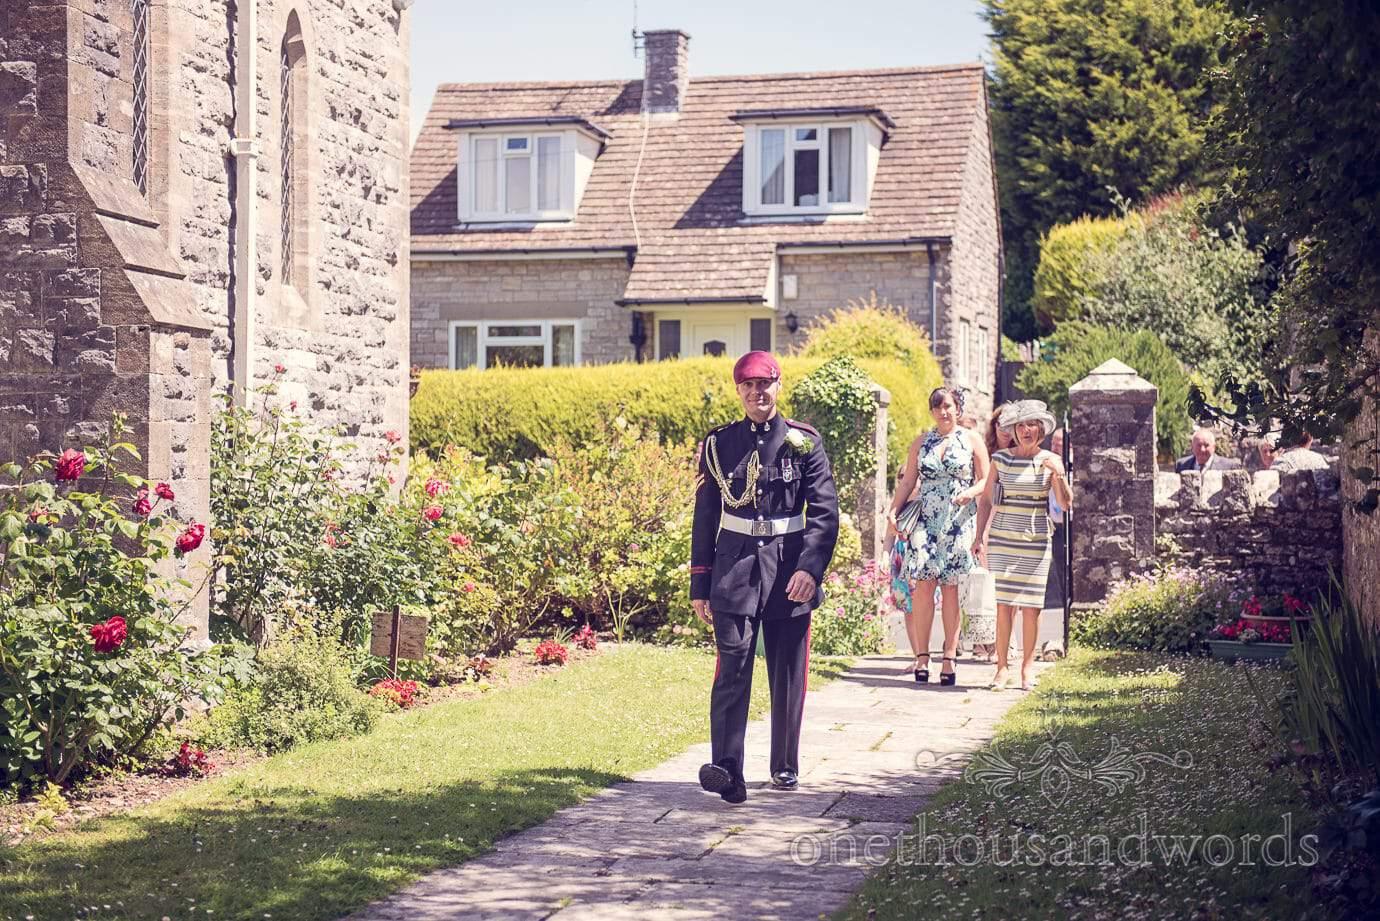 Groom in military uniform walks into church wedding garden in Swanage